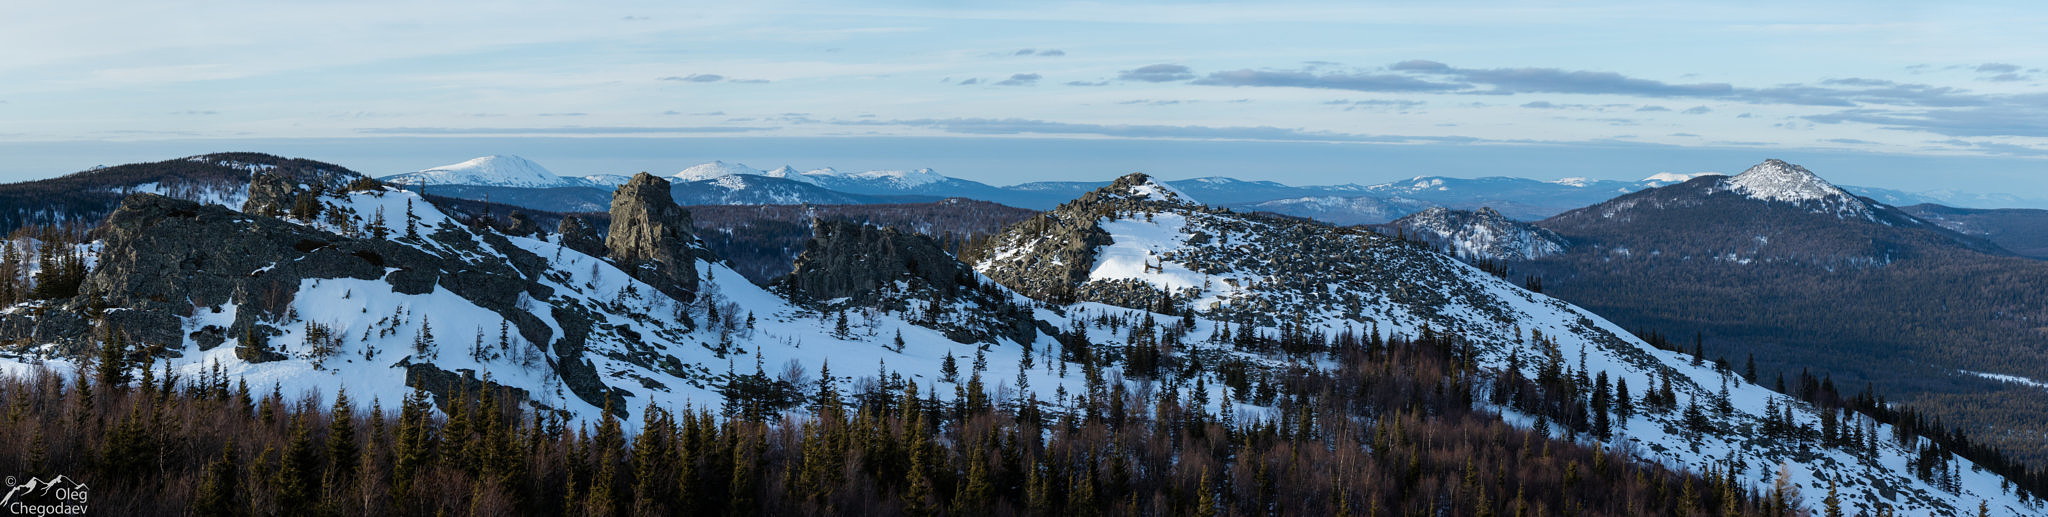 Вершина горы Медвежья (кумардак)